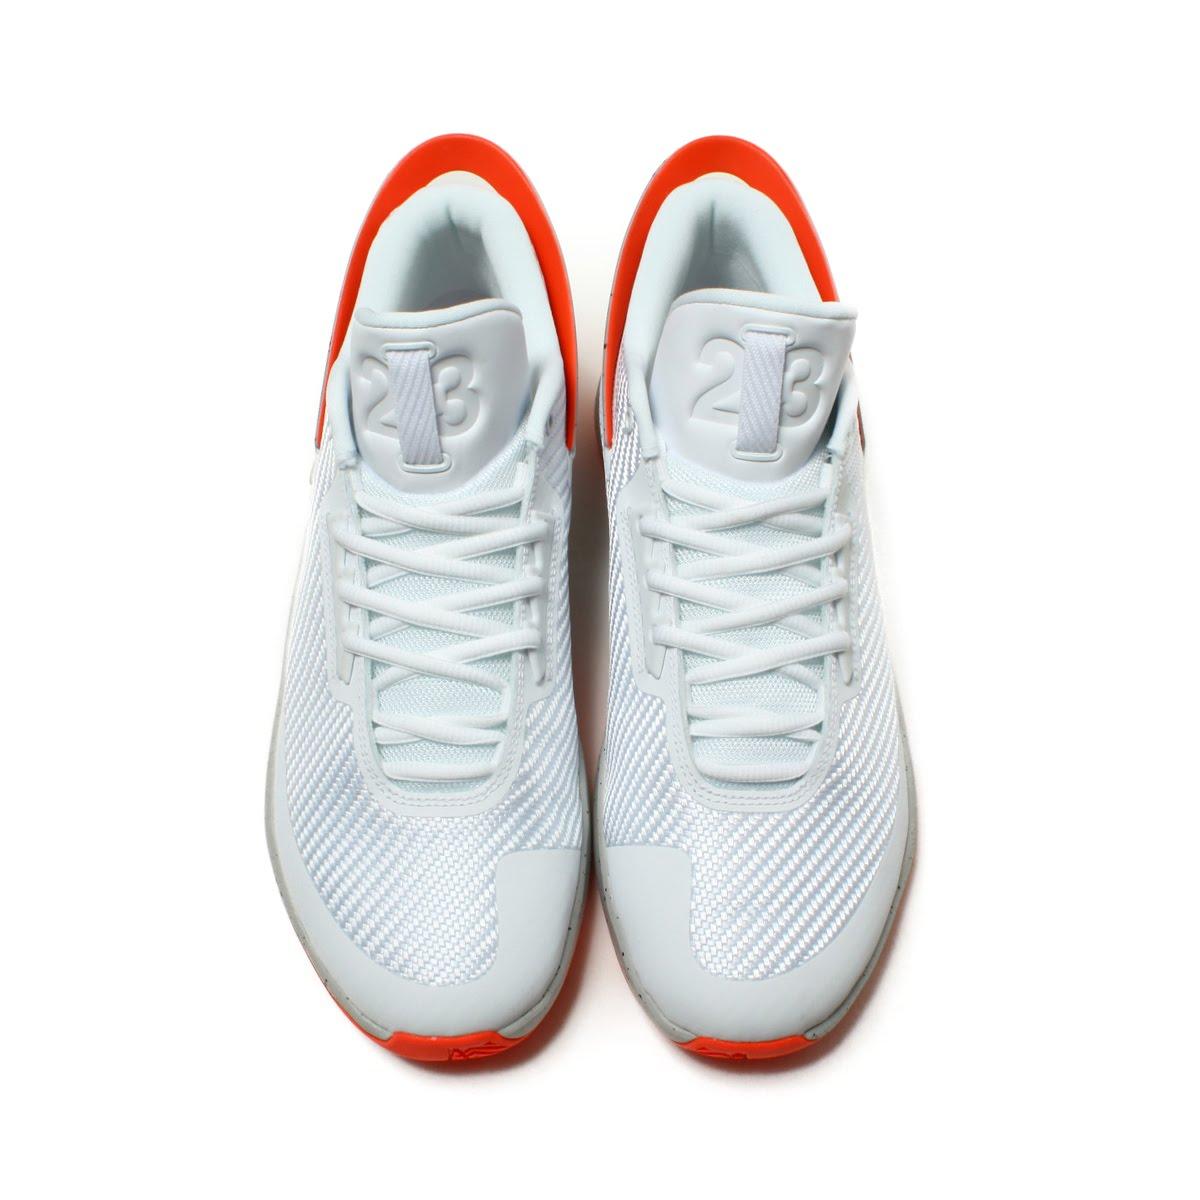 NIKE JORDAN FLY LOCKDOWN PFX (Nike Jordan fly lock down PFX)  WHITE/WHITE-TECH GREY-INFRARED 23 18SP-I